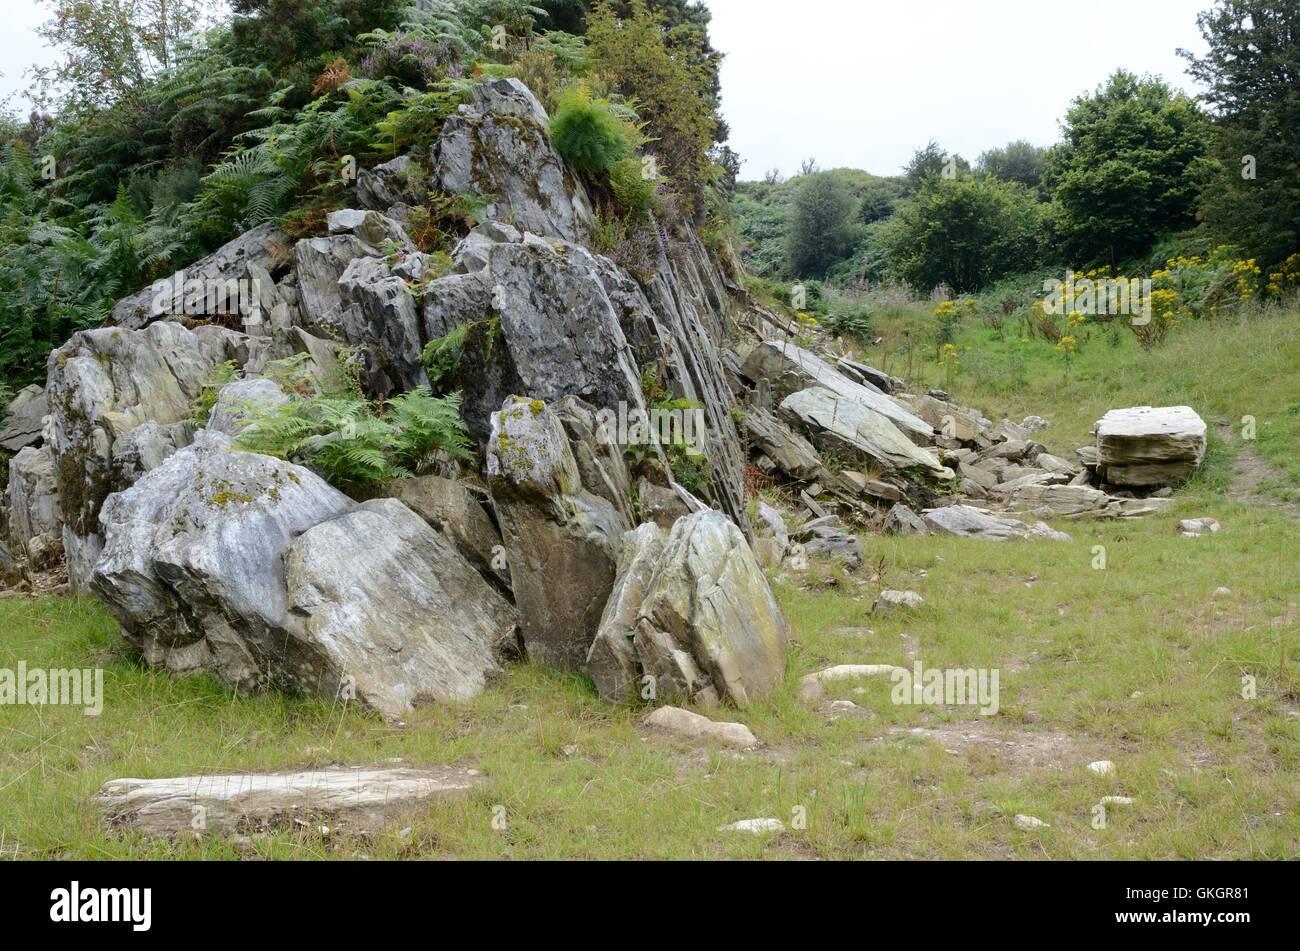 Craig Rhos-y-Felin Pont Saeson rock outcrop Crosswell Pembrokeshire - Stock Image